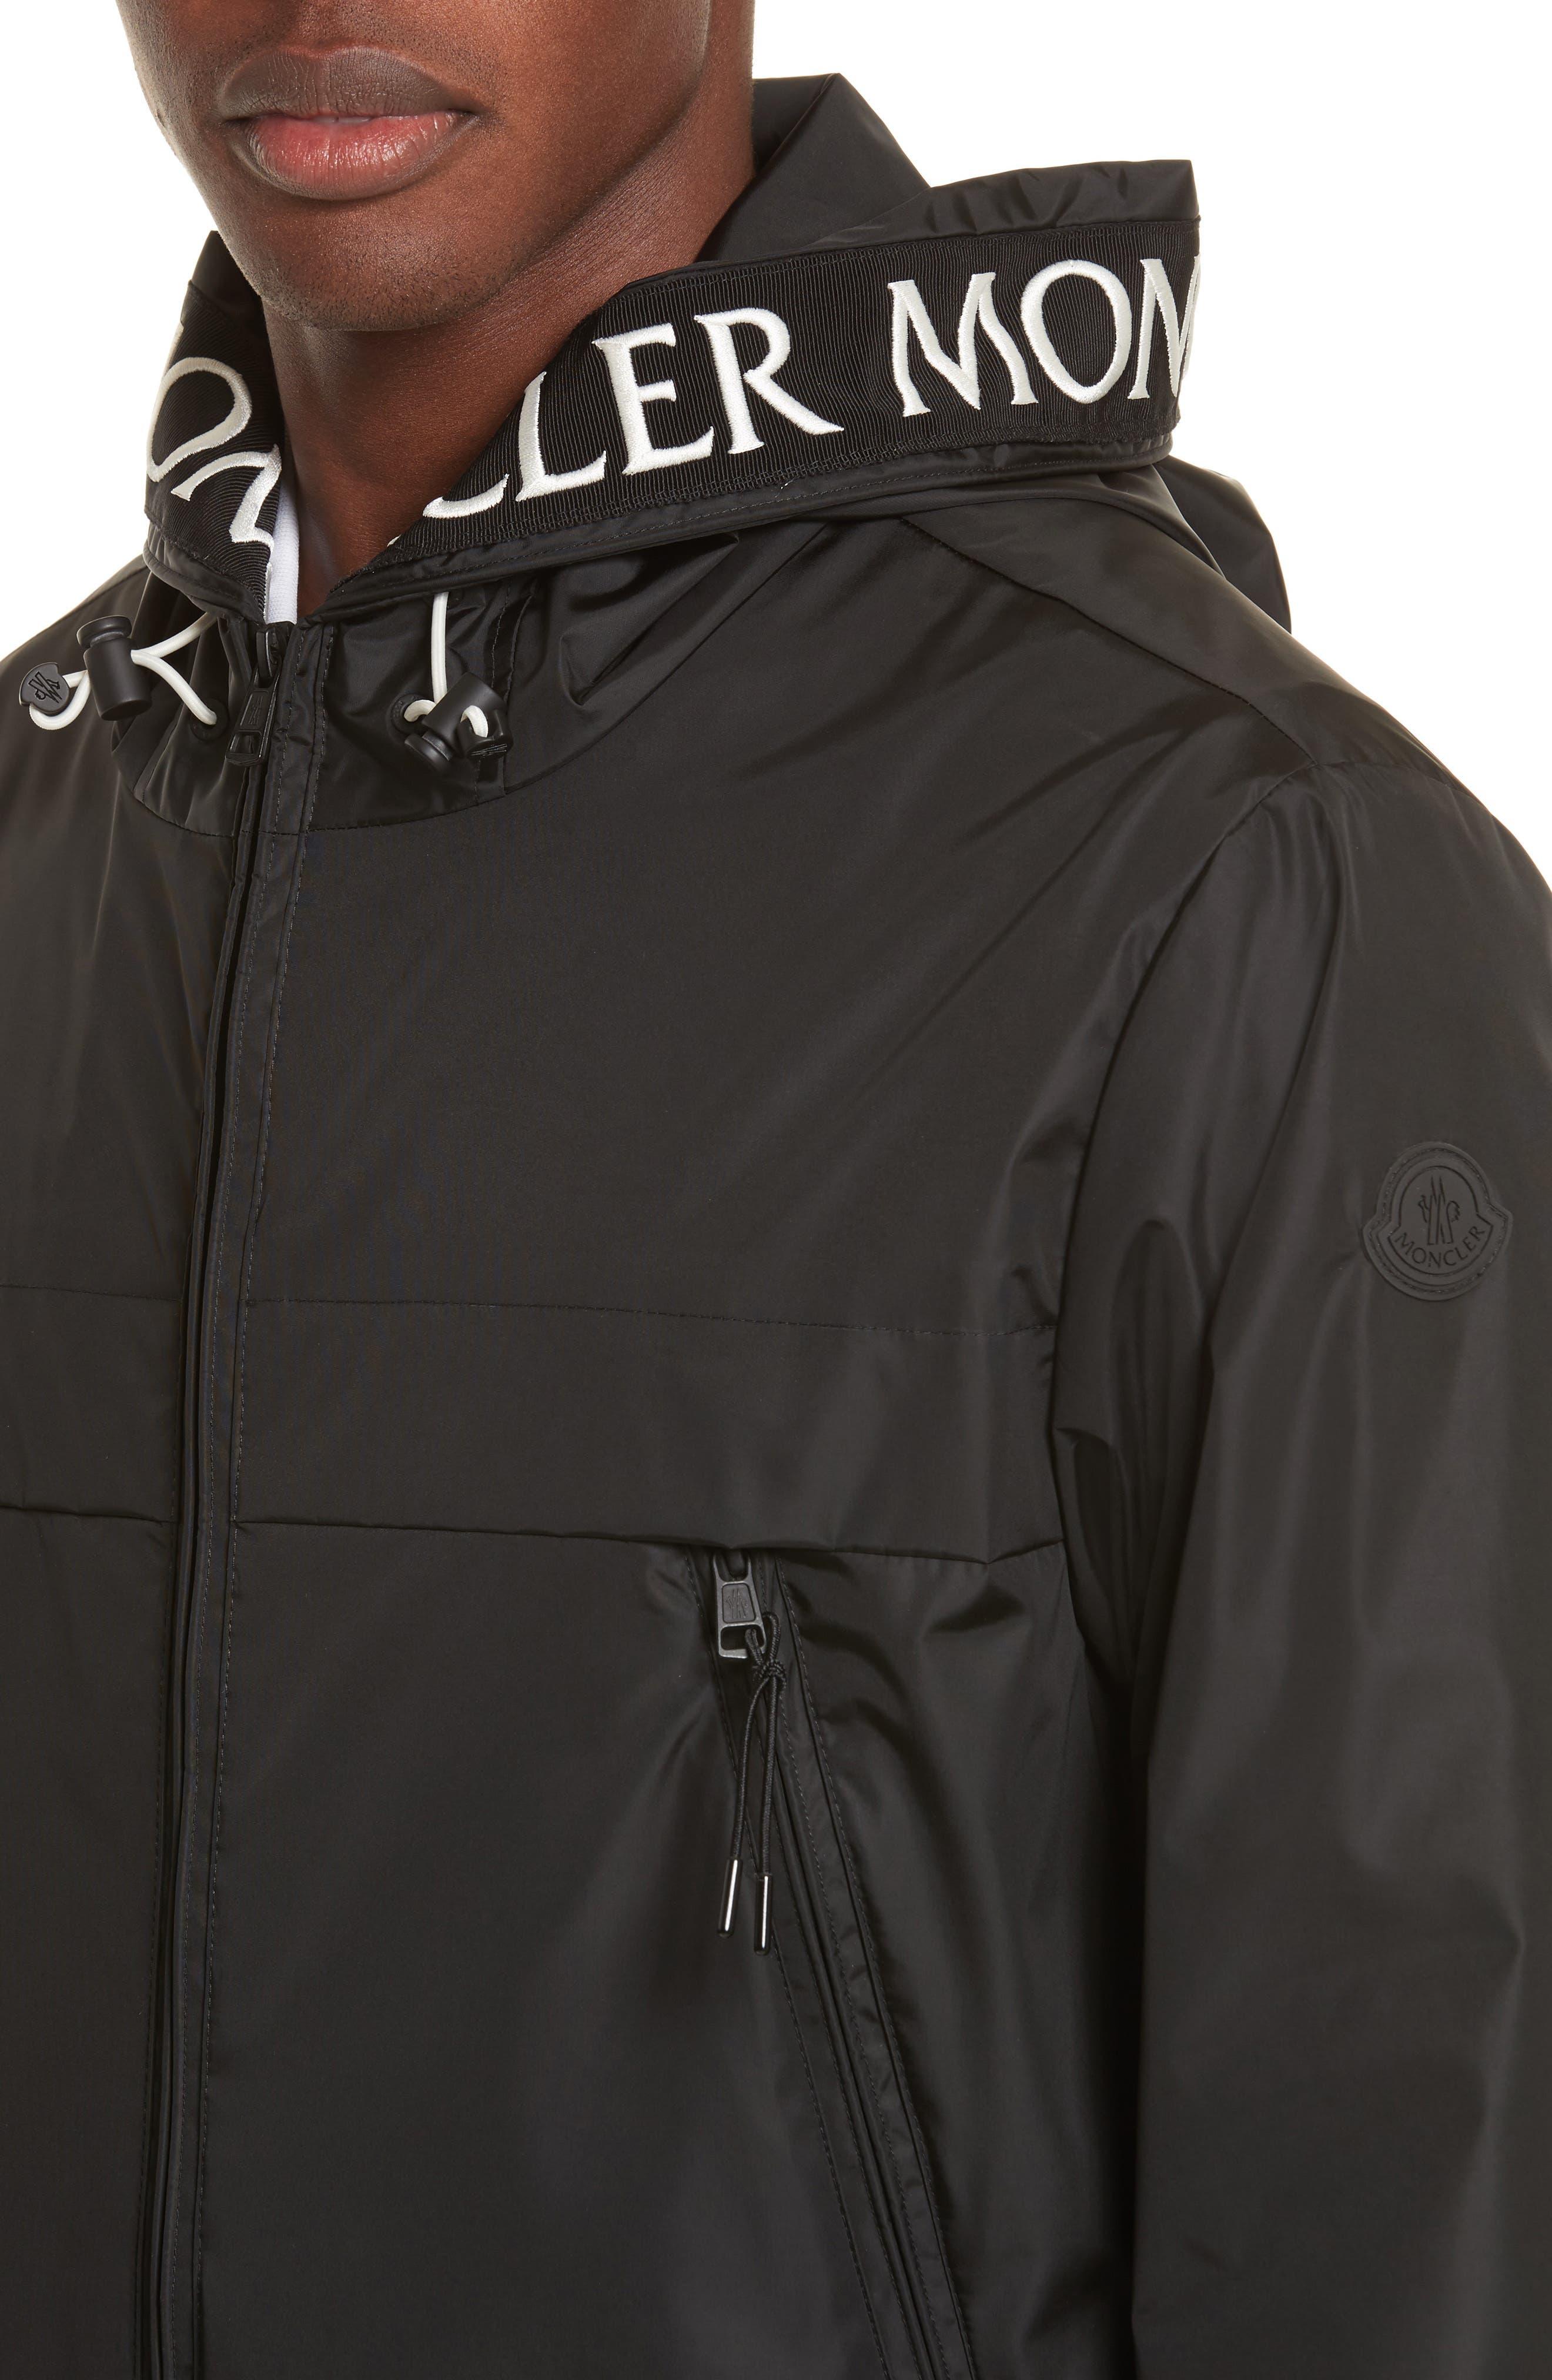 Massereau Zip Jacket,                             Alternate thumbnail 4, color,                             Black